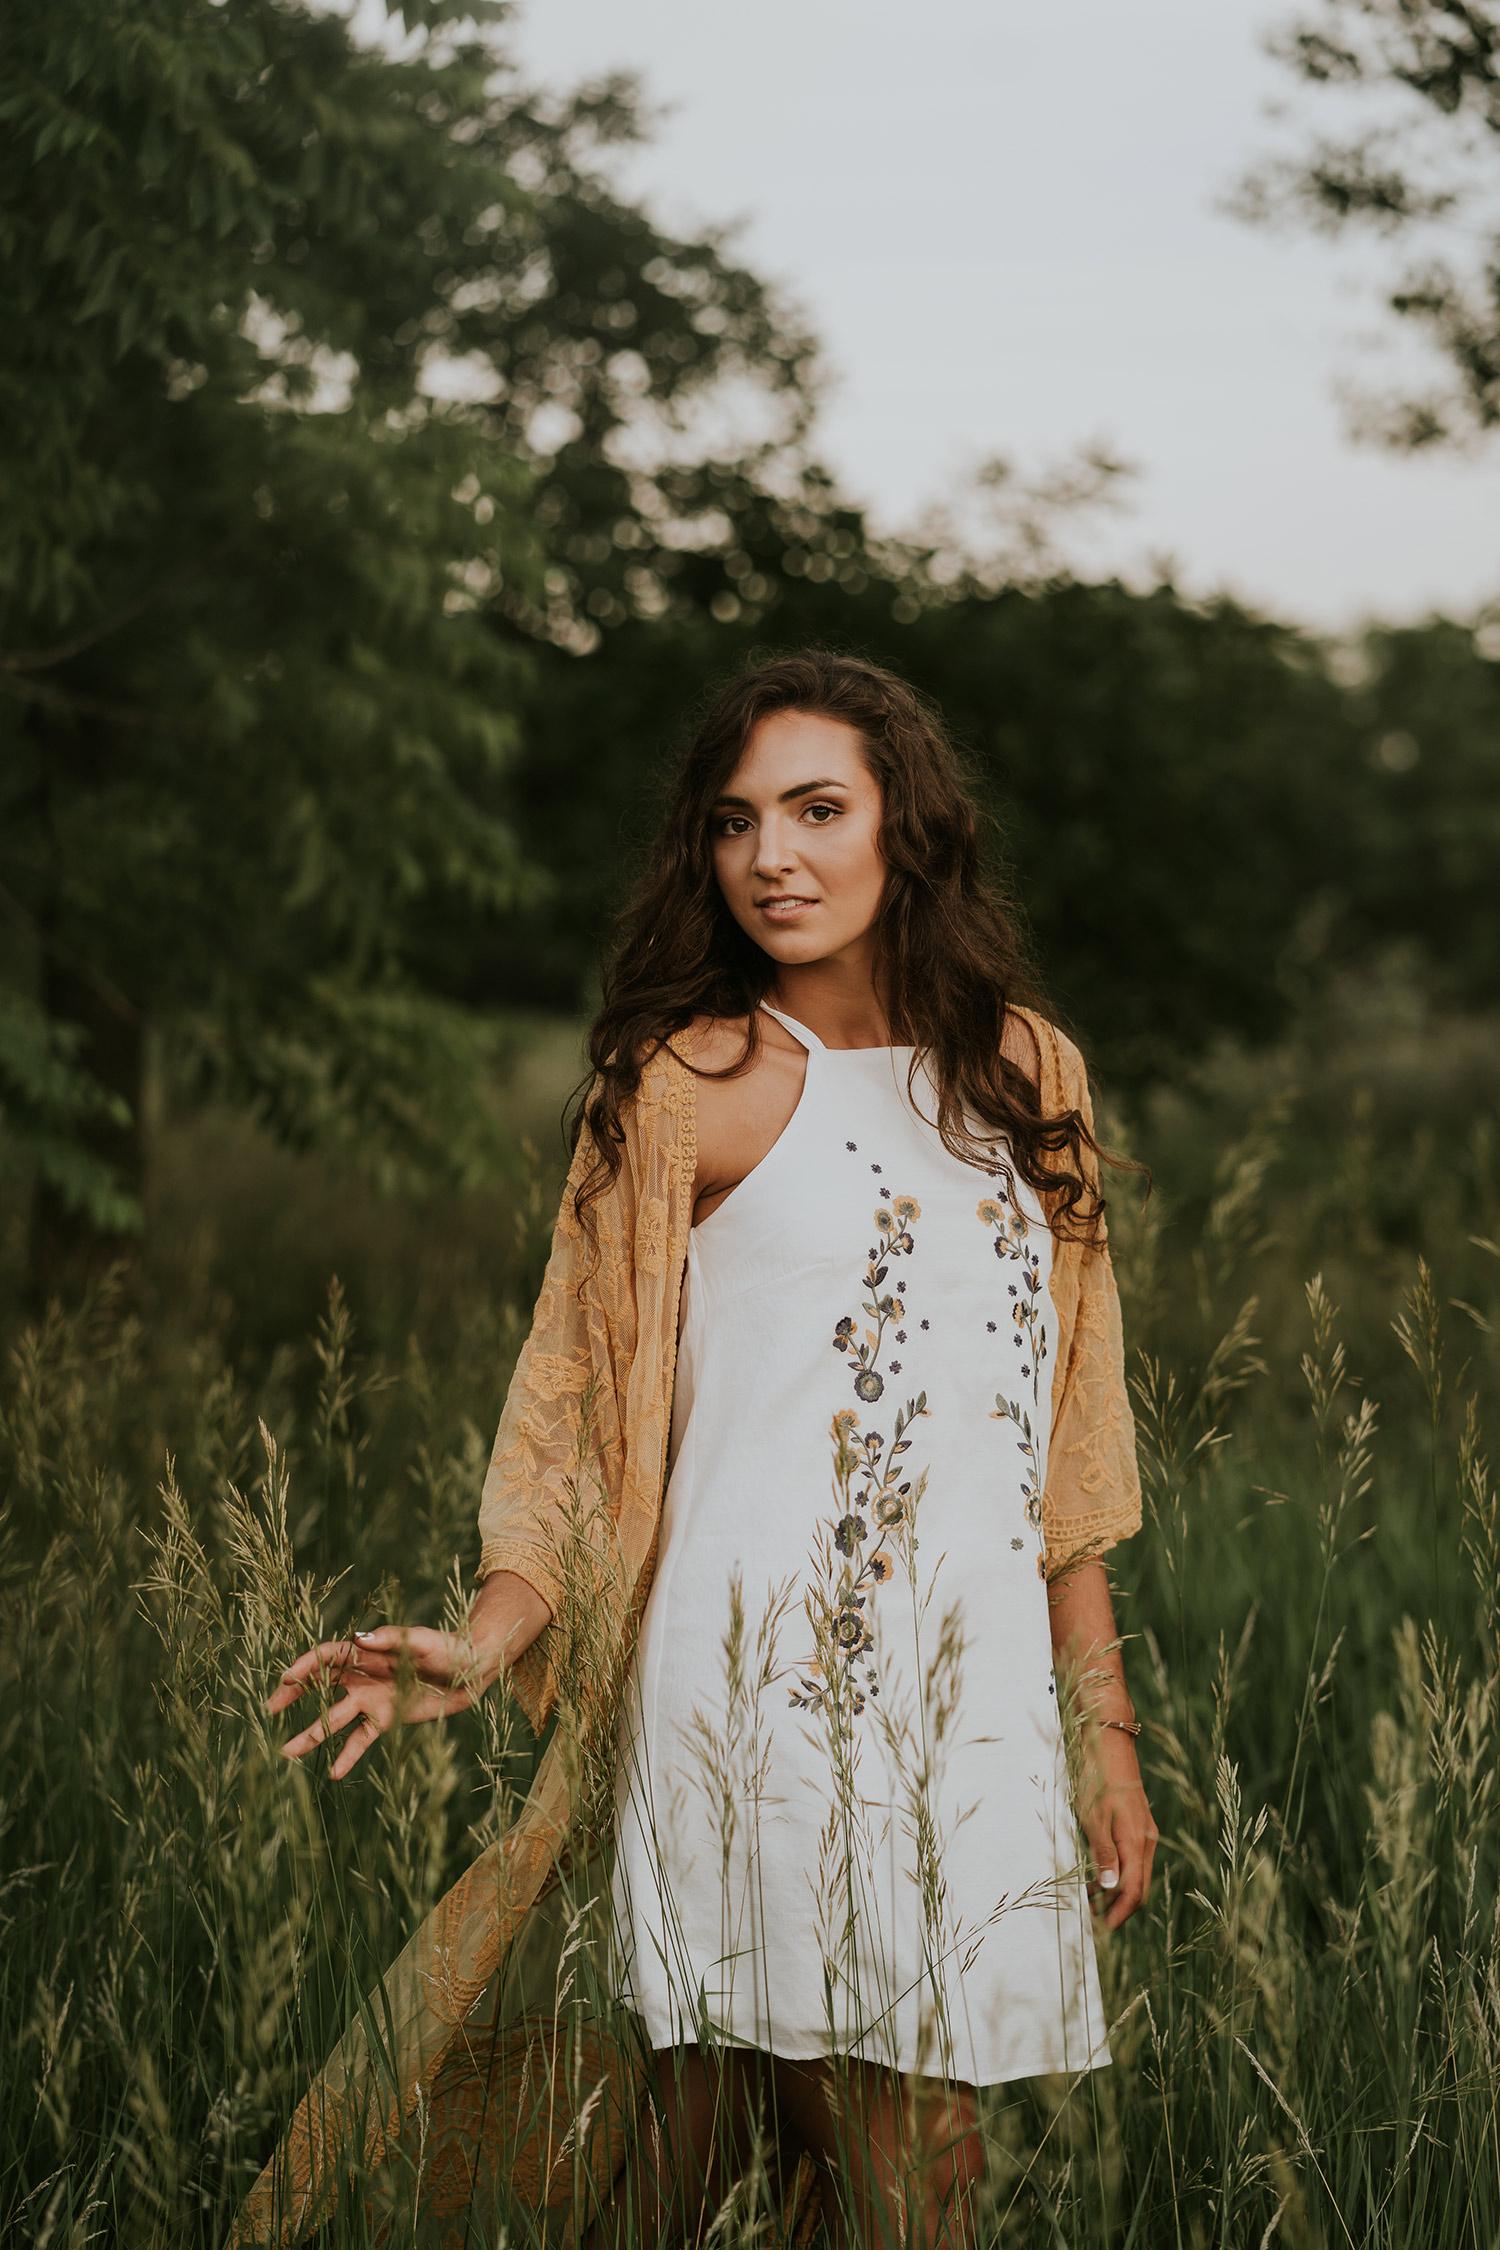 lizzy-senior-iris-aisle-girl-in-tall-grass-ankeny-high-school-desmoines-iowa-raelyn-ramey-photography-116.jpg